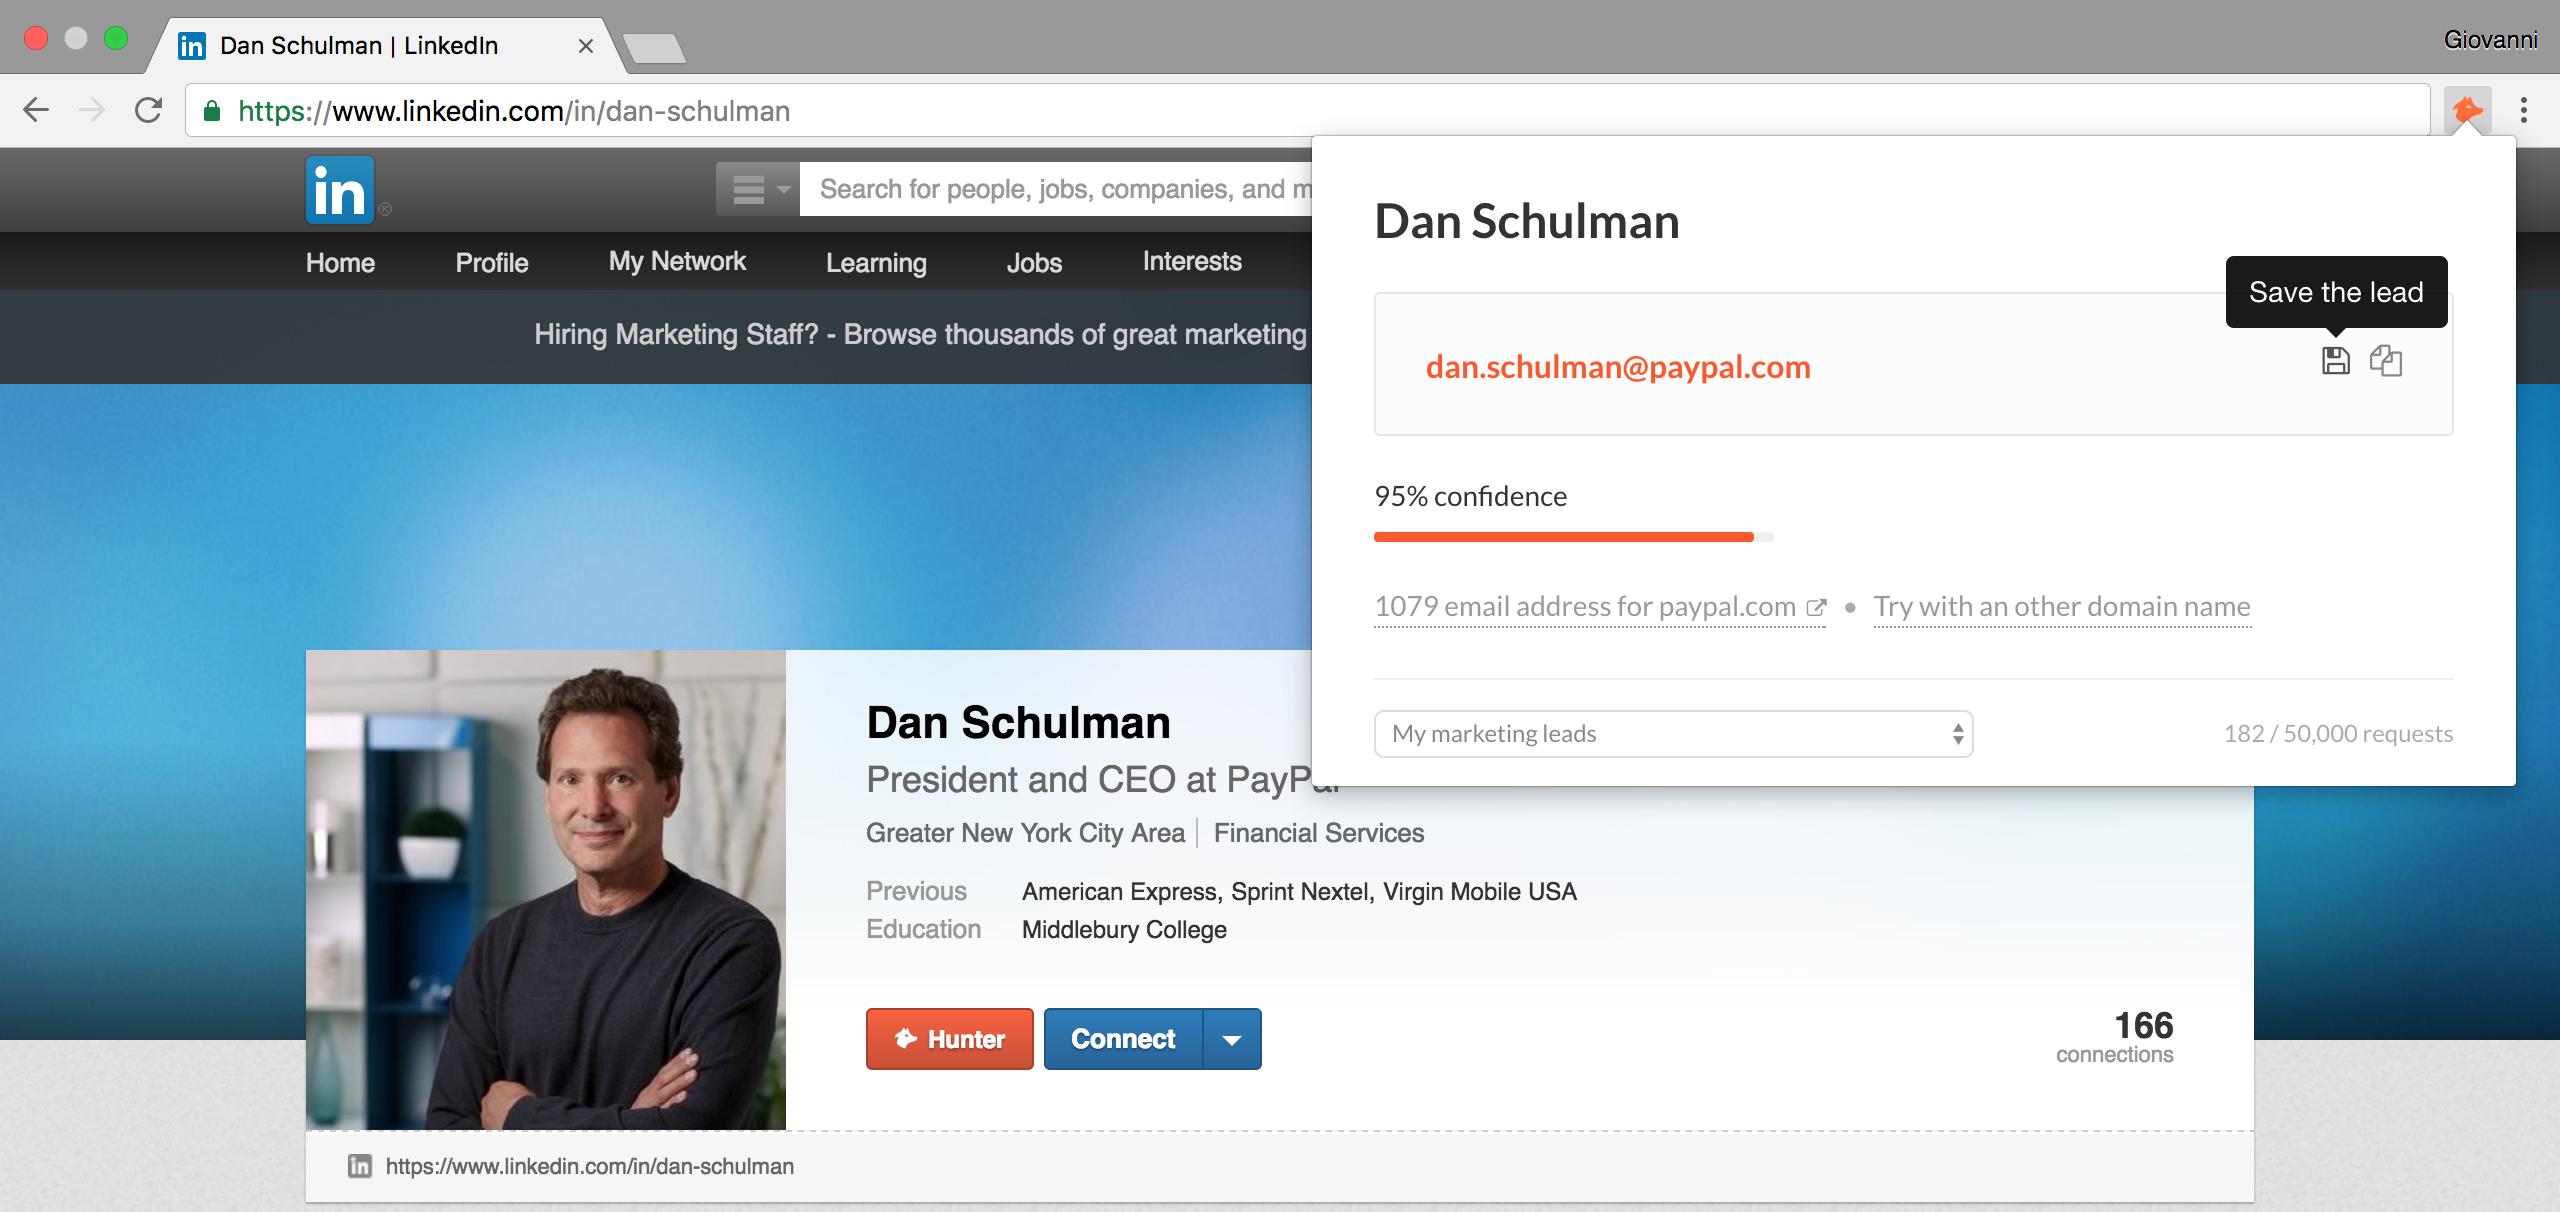 Hunter Google Leads LinkedIn Leads Buttons